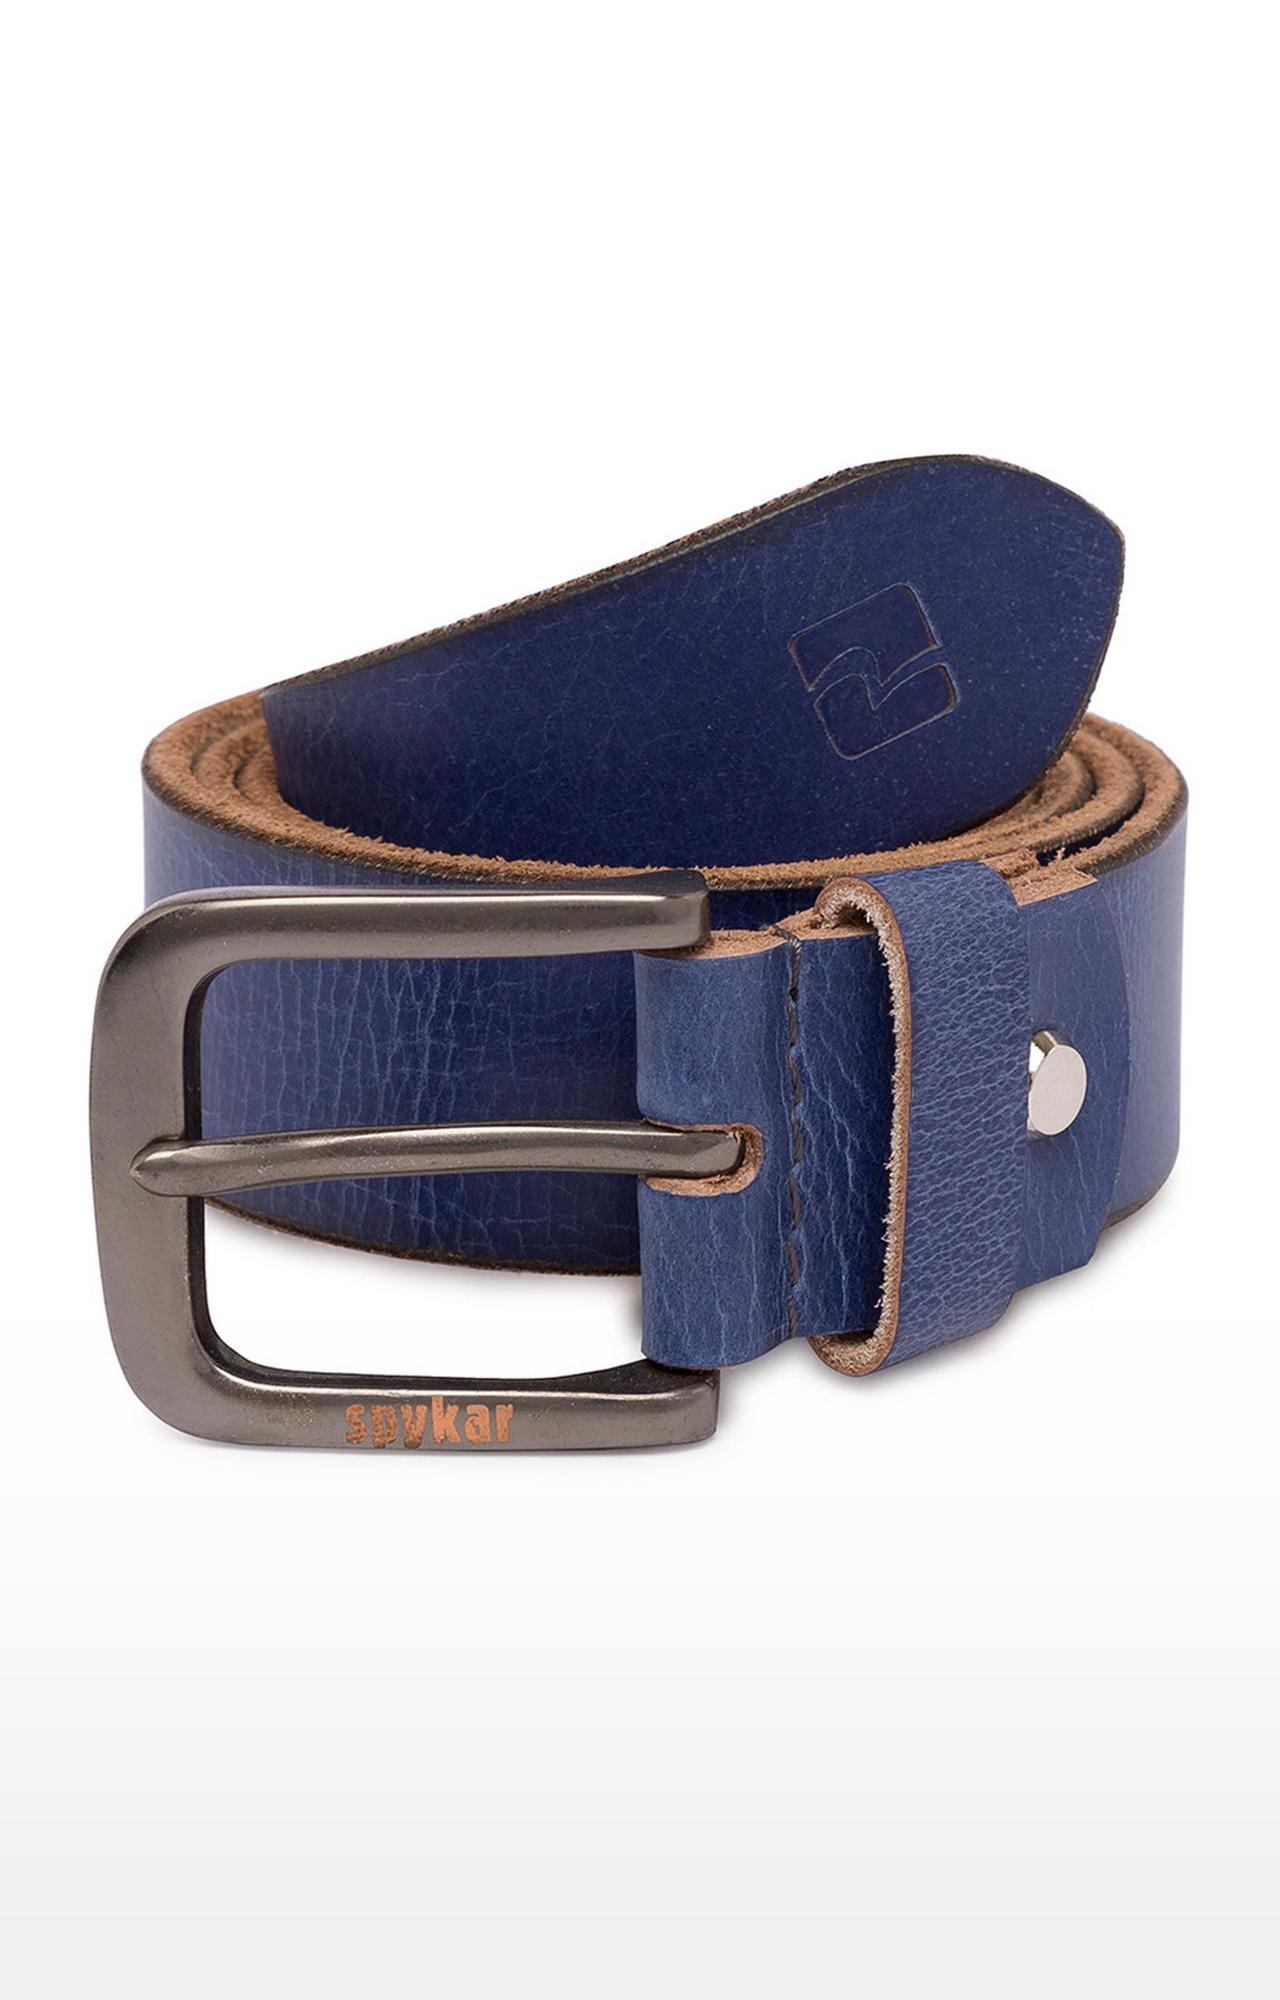 Spykar | Spykar Blue Belt